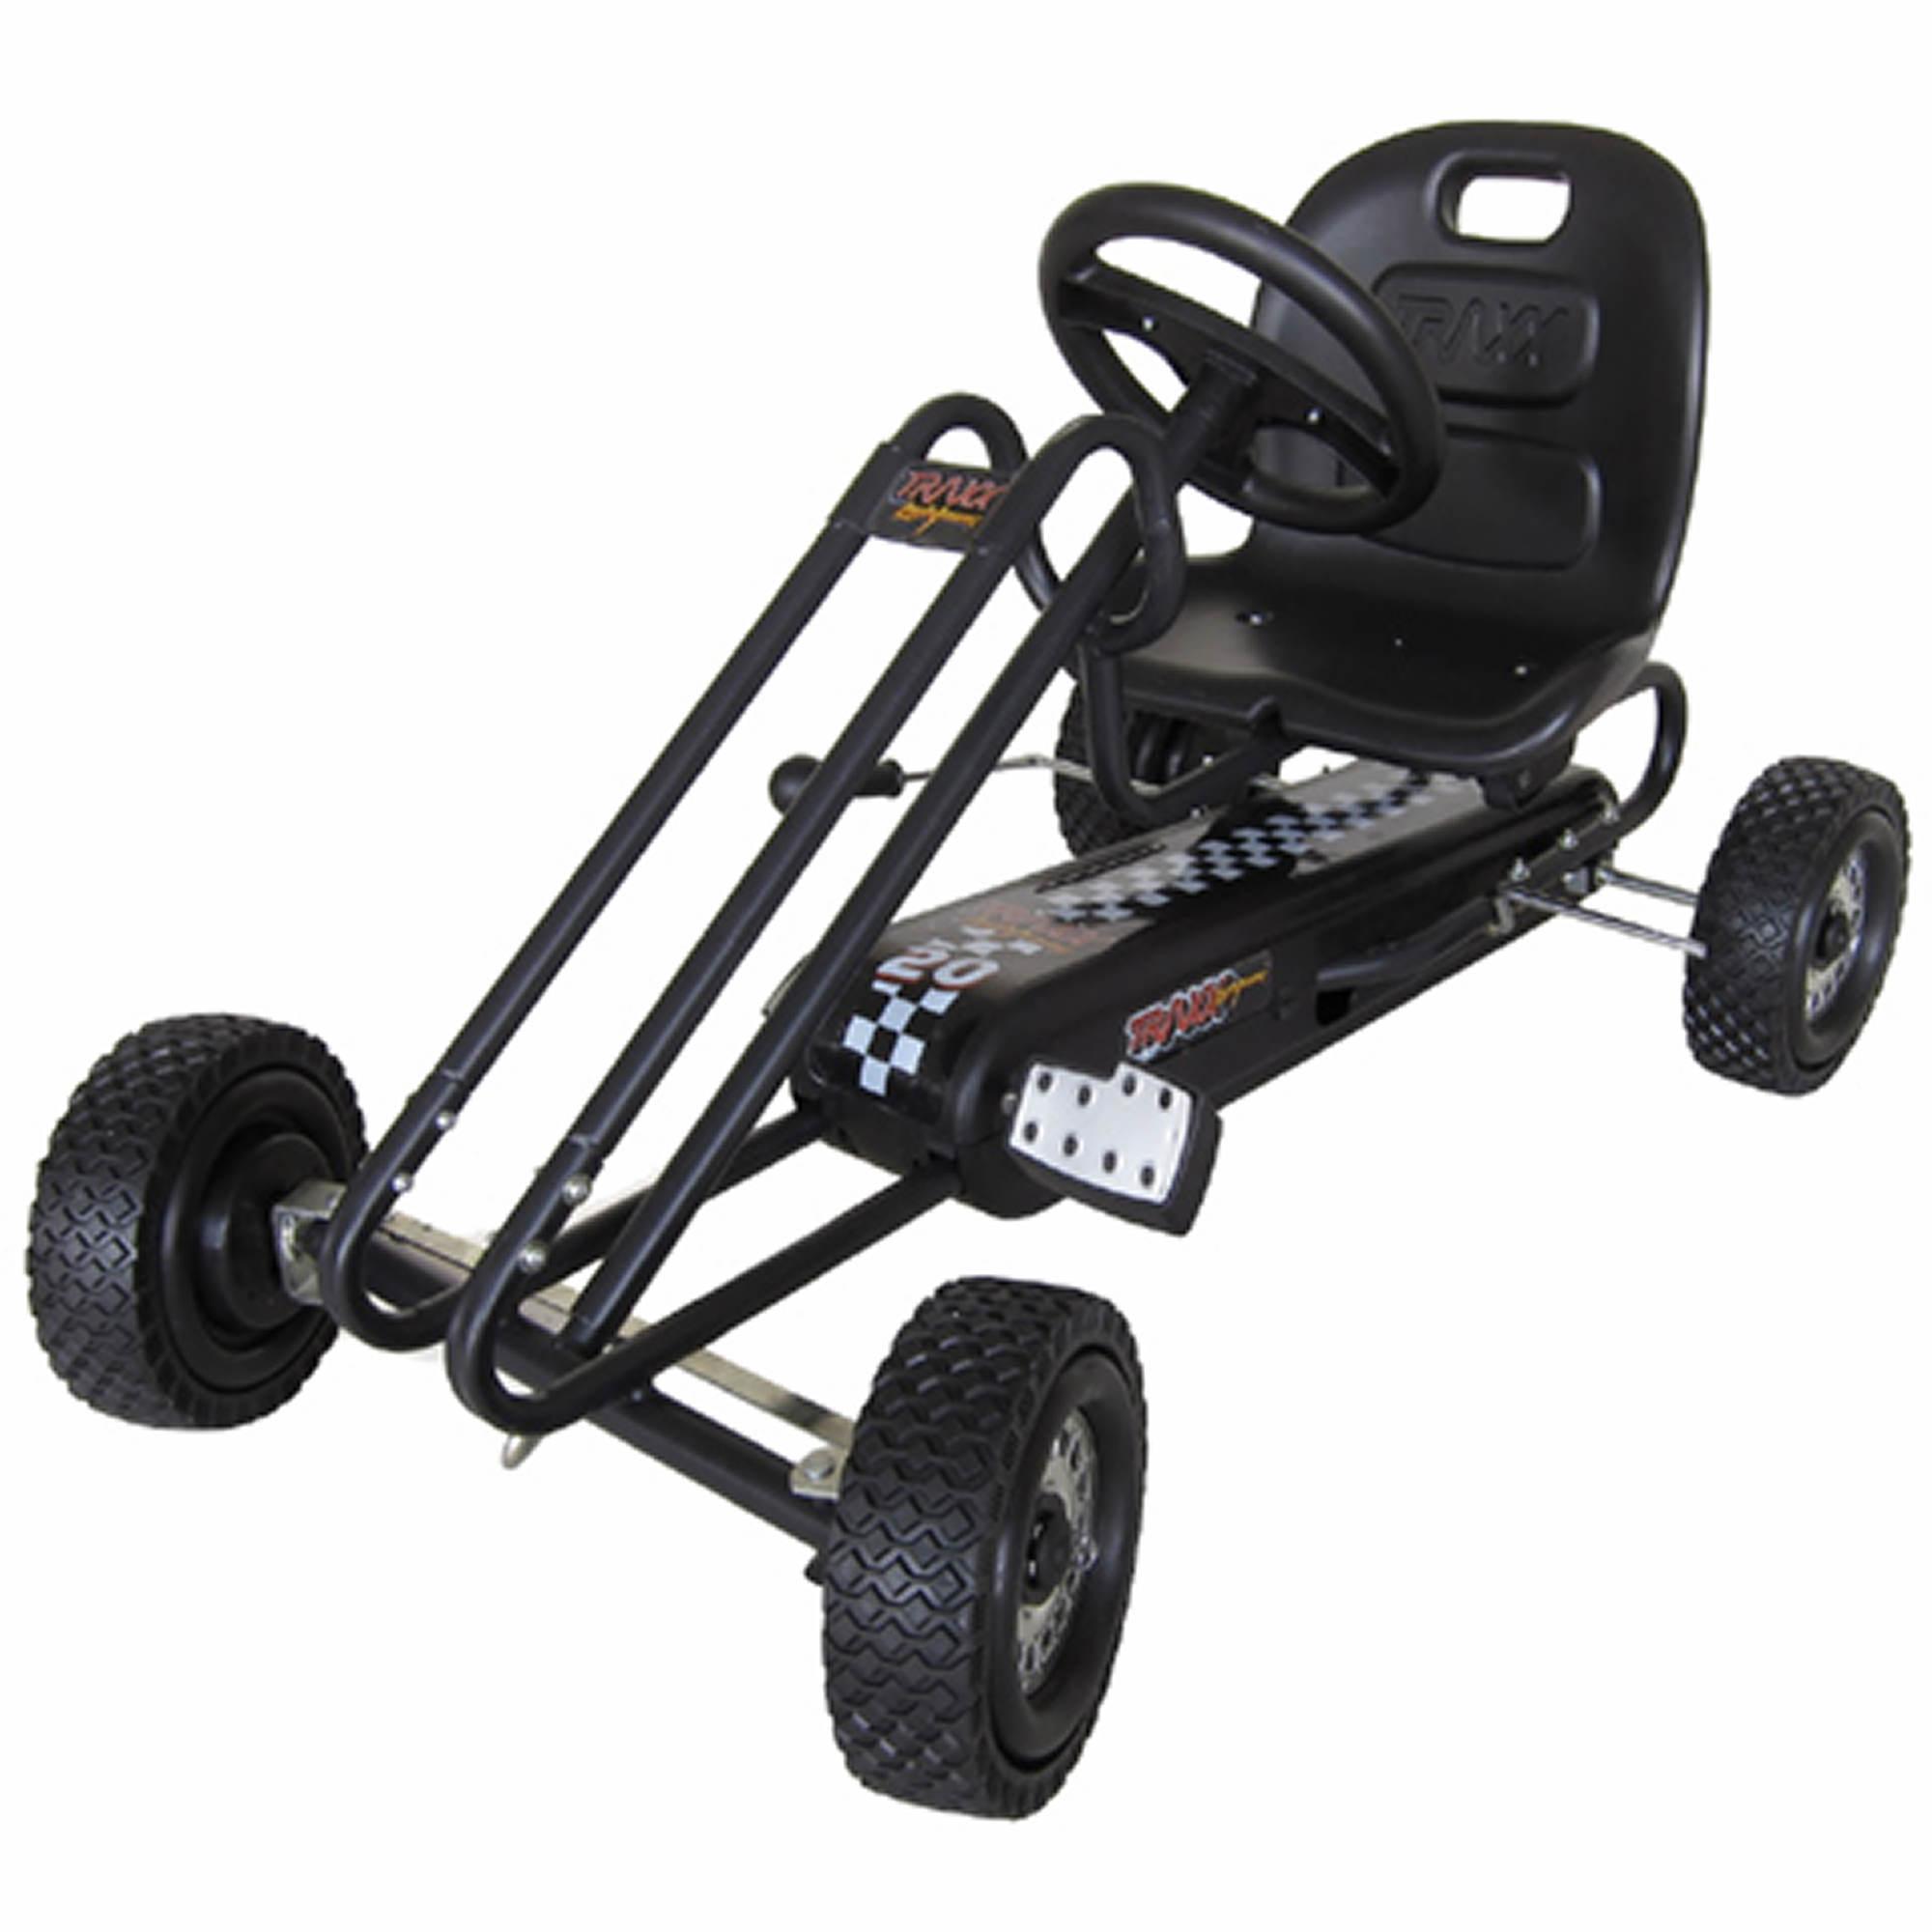 Hauck Traxx Lightning Pedal Go-Kart